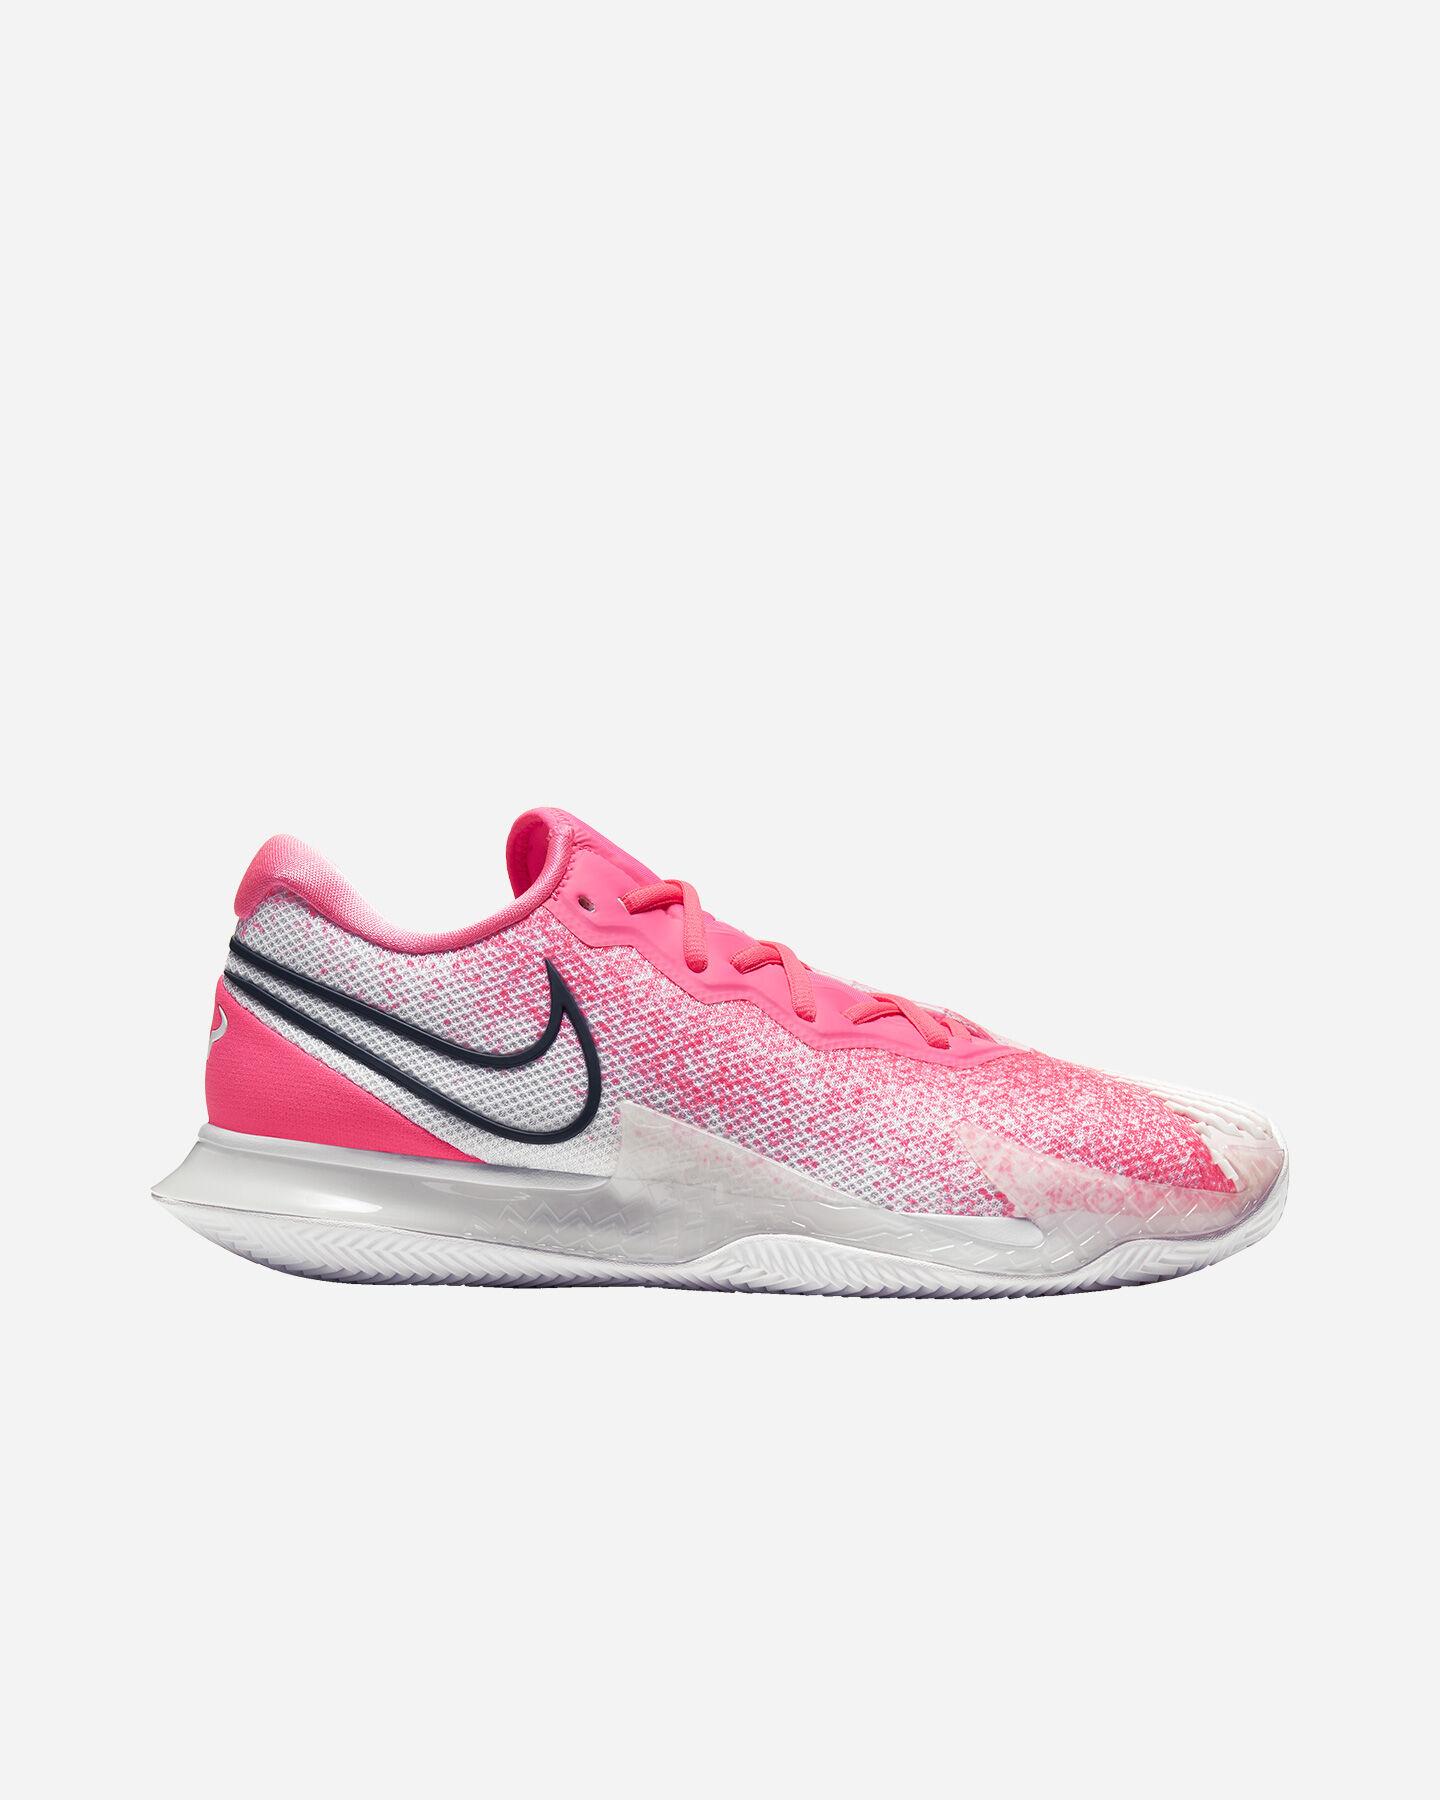 scarpe tennis all court nike